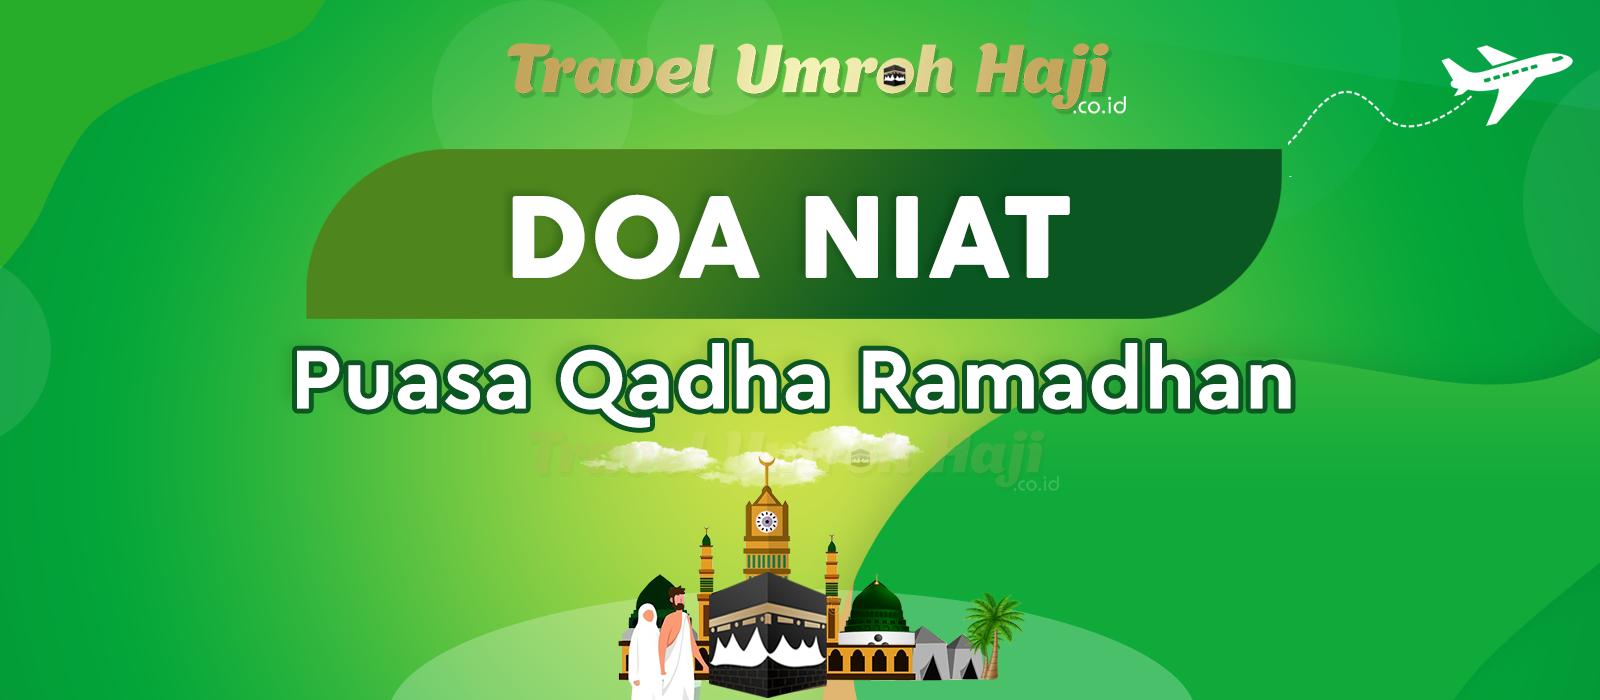 Bacaan Doa dan Niat Ber Puasa Qadha Ramadhan